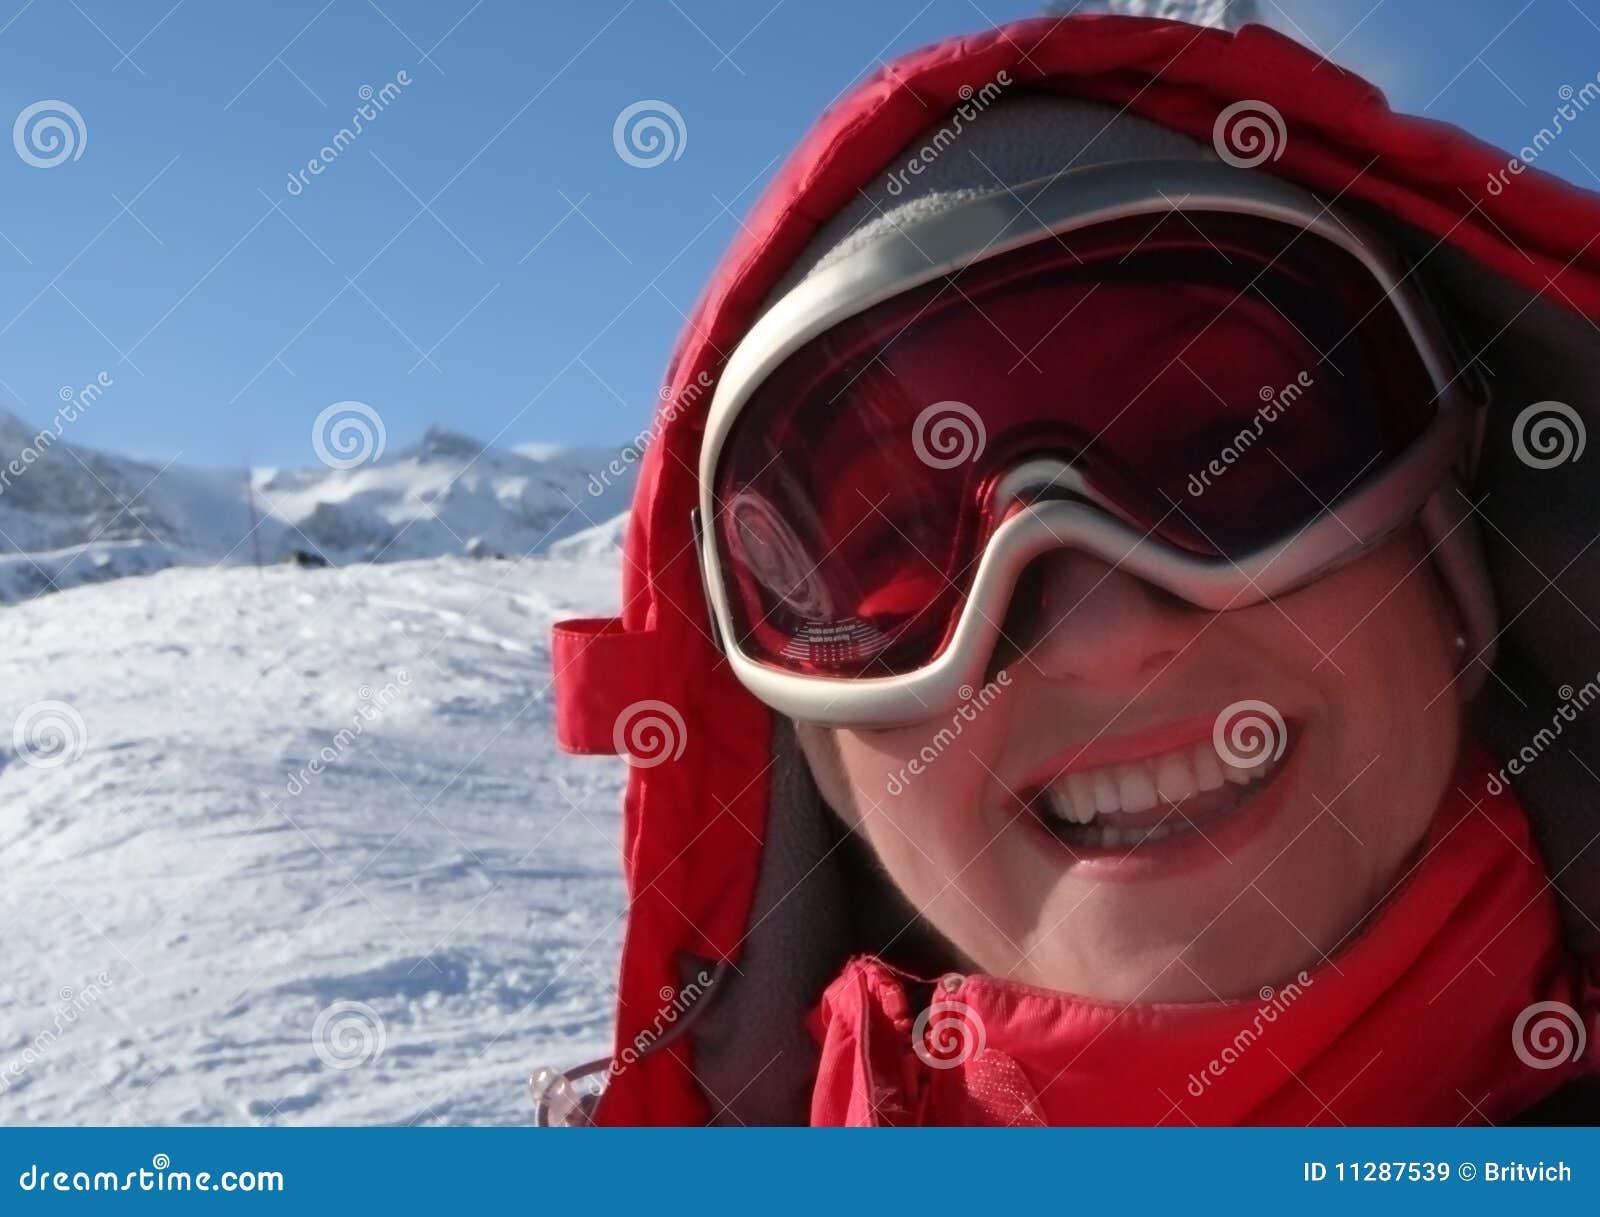 Winter portait of skier